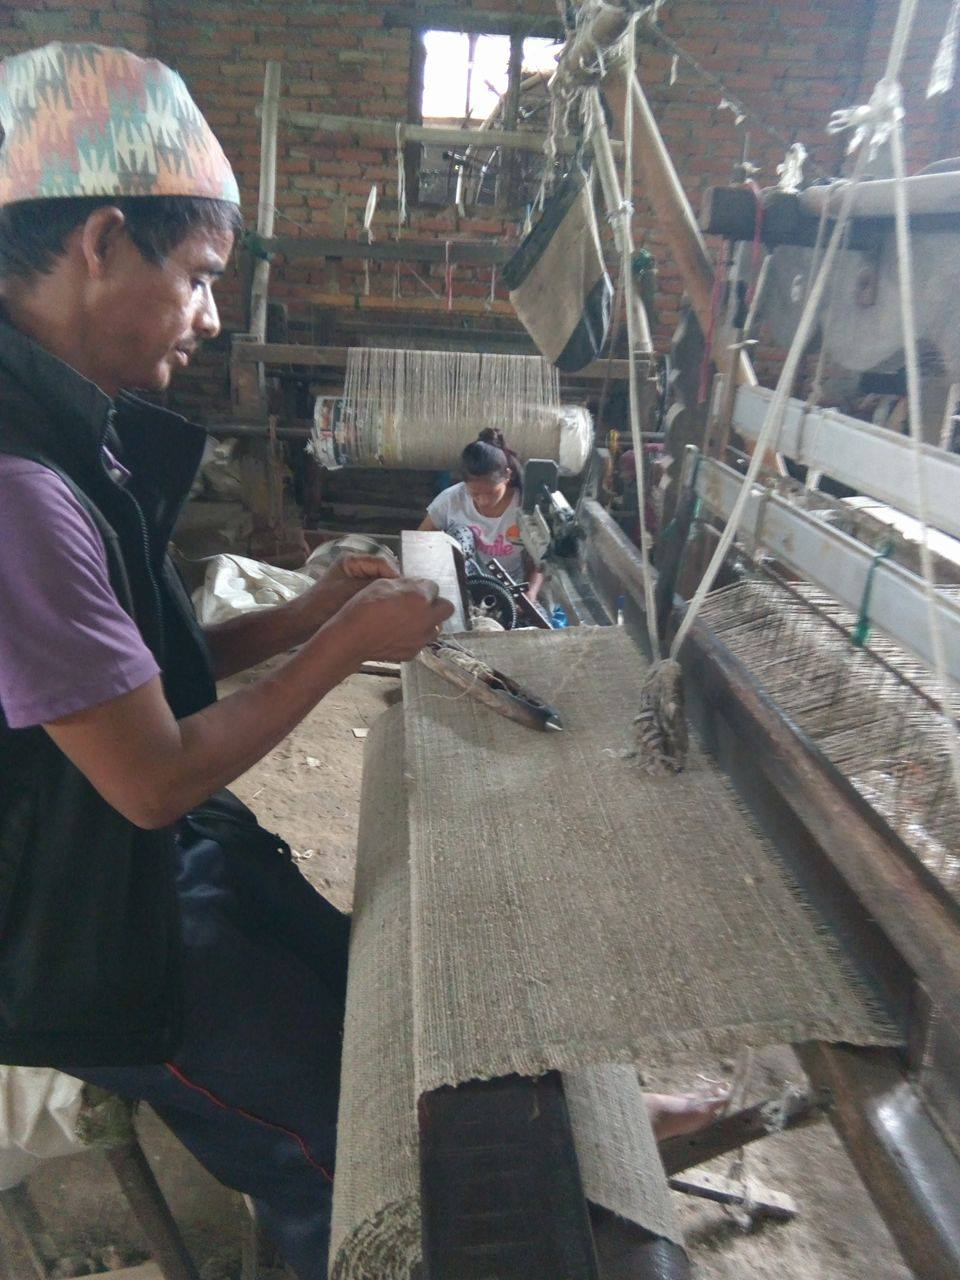 Handgewebte Webstoffe aus Nepal